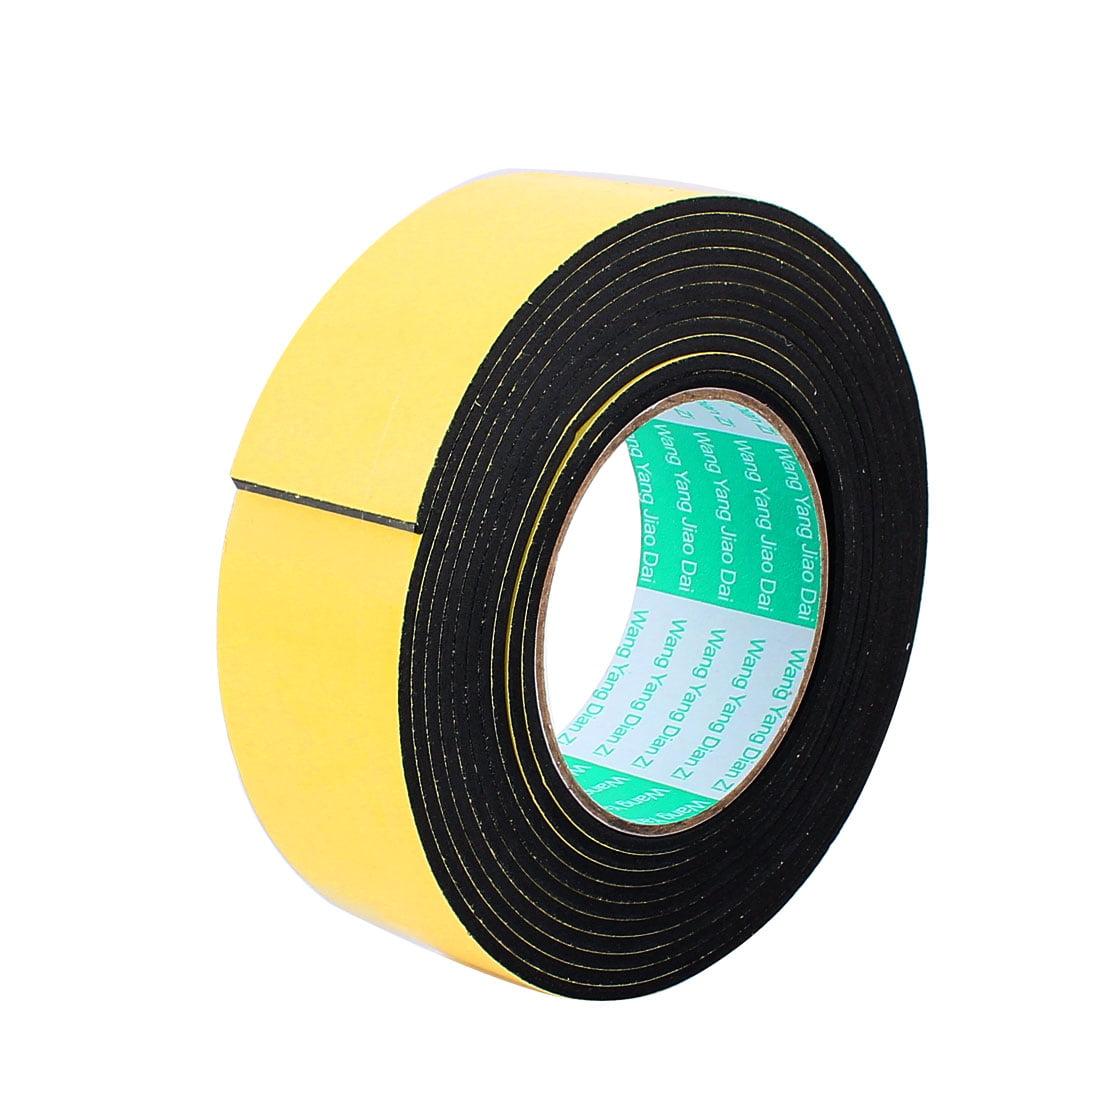 4.5CM Width 4M Length 3MM Thick Single-side Sealing Shockproof Sponge Tape